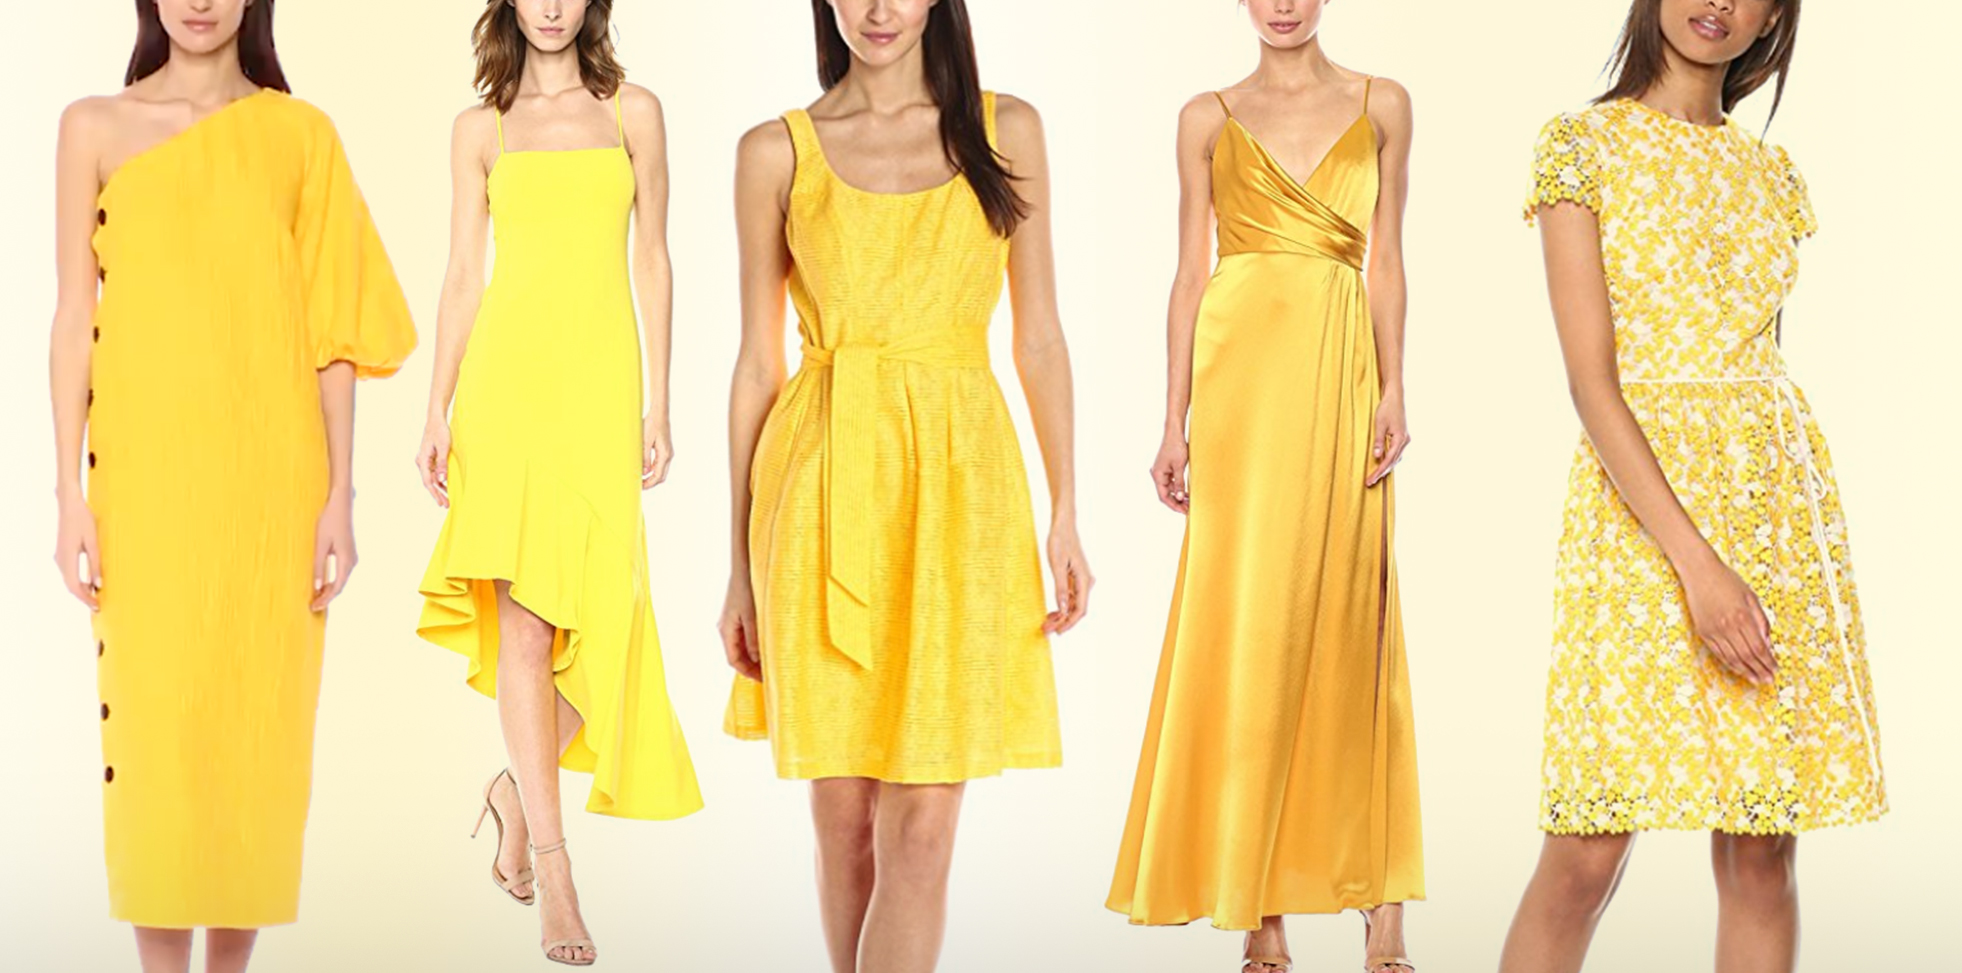 2c01ad4275 COLOR DRESSES FOR SUMMER    AMAZON FASHION